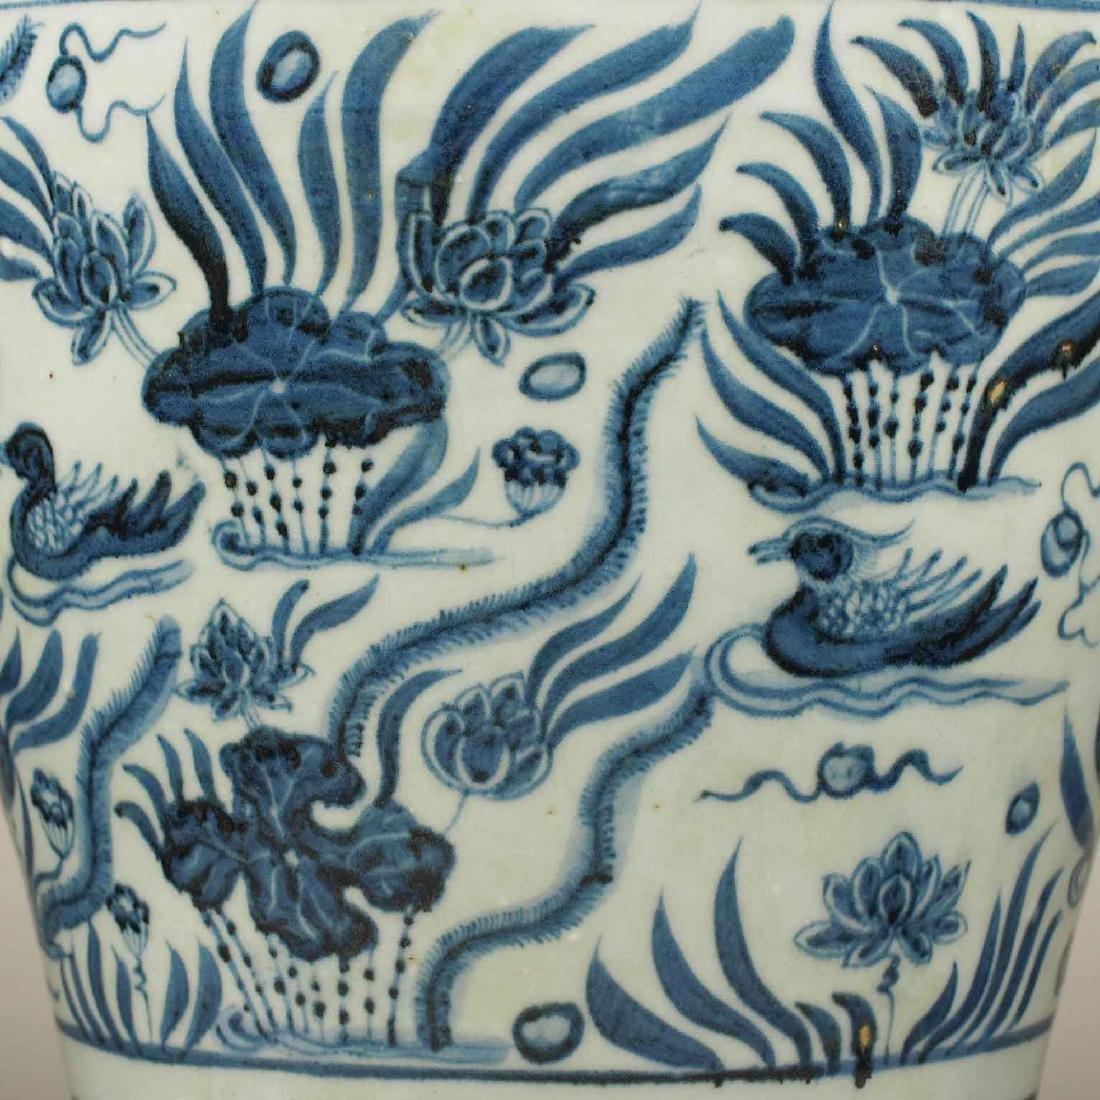 Lion-Head Handled Vase with Mandarin Ducks, early Ming - 5